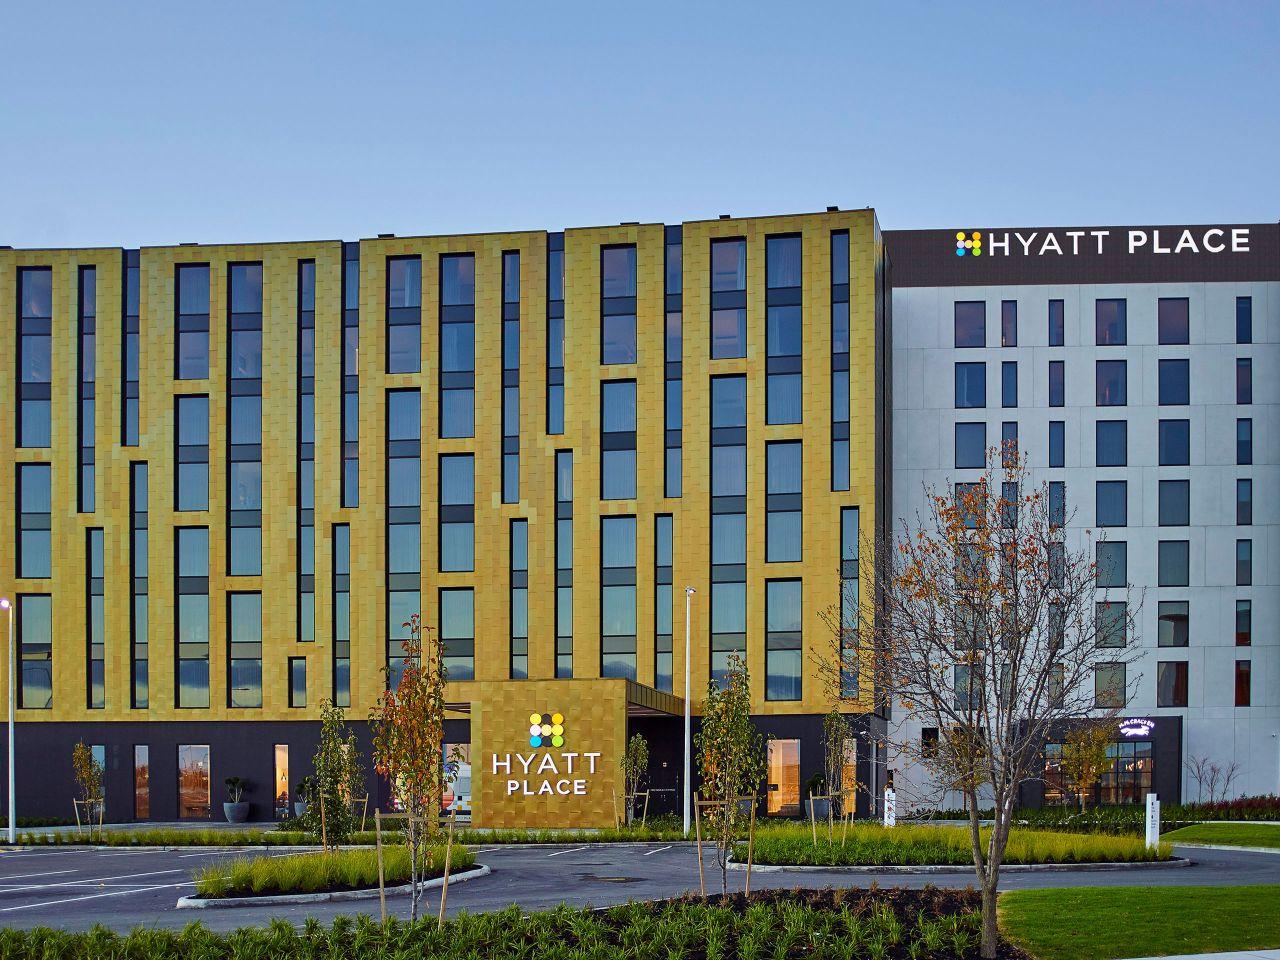 Hyatt Place Melbourne Exterior